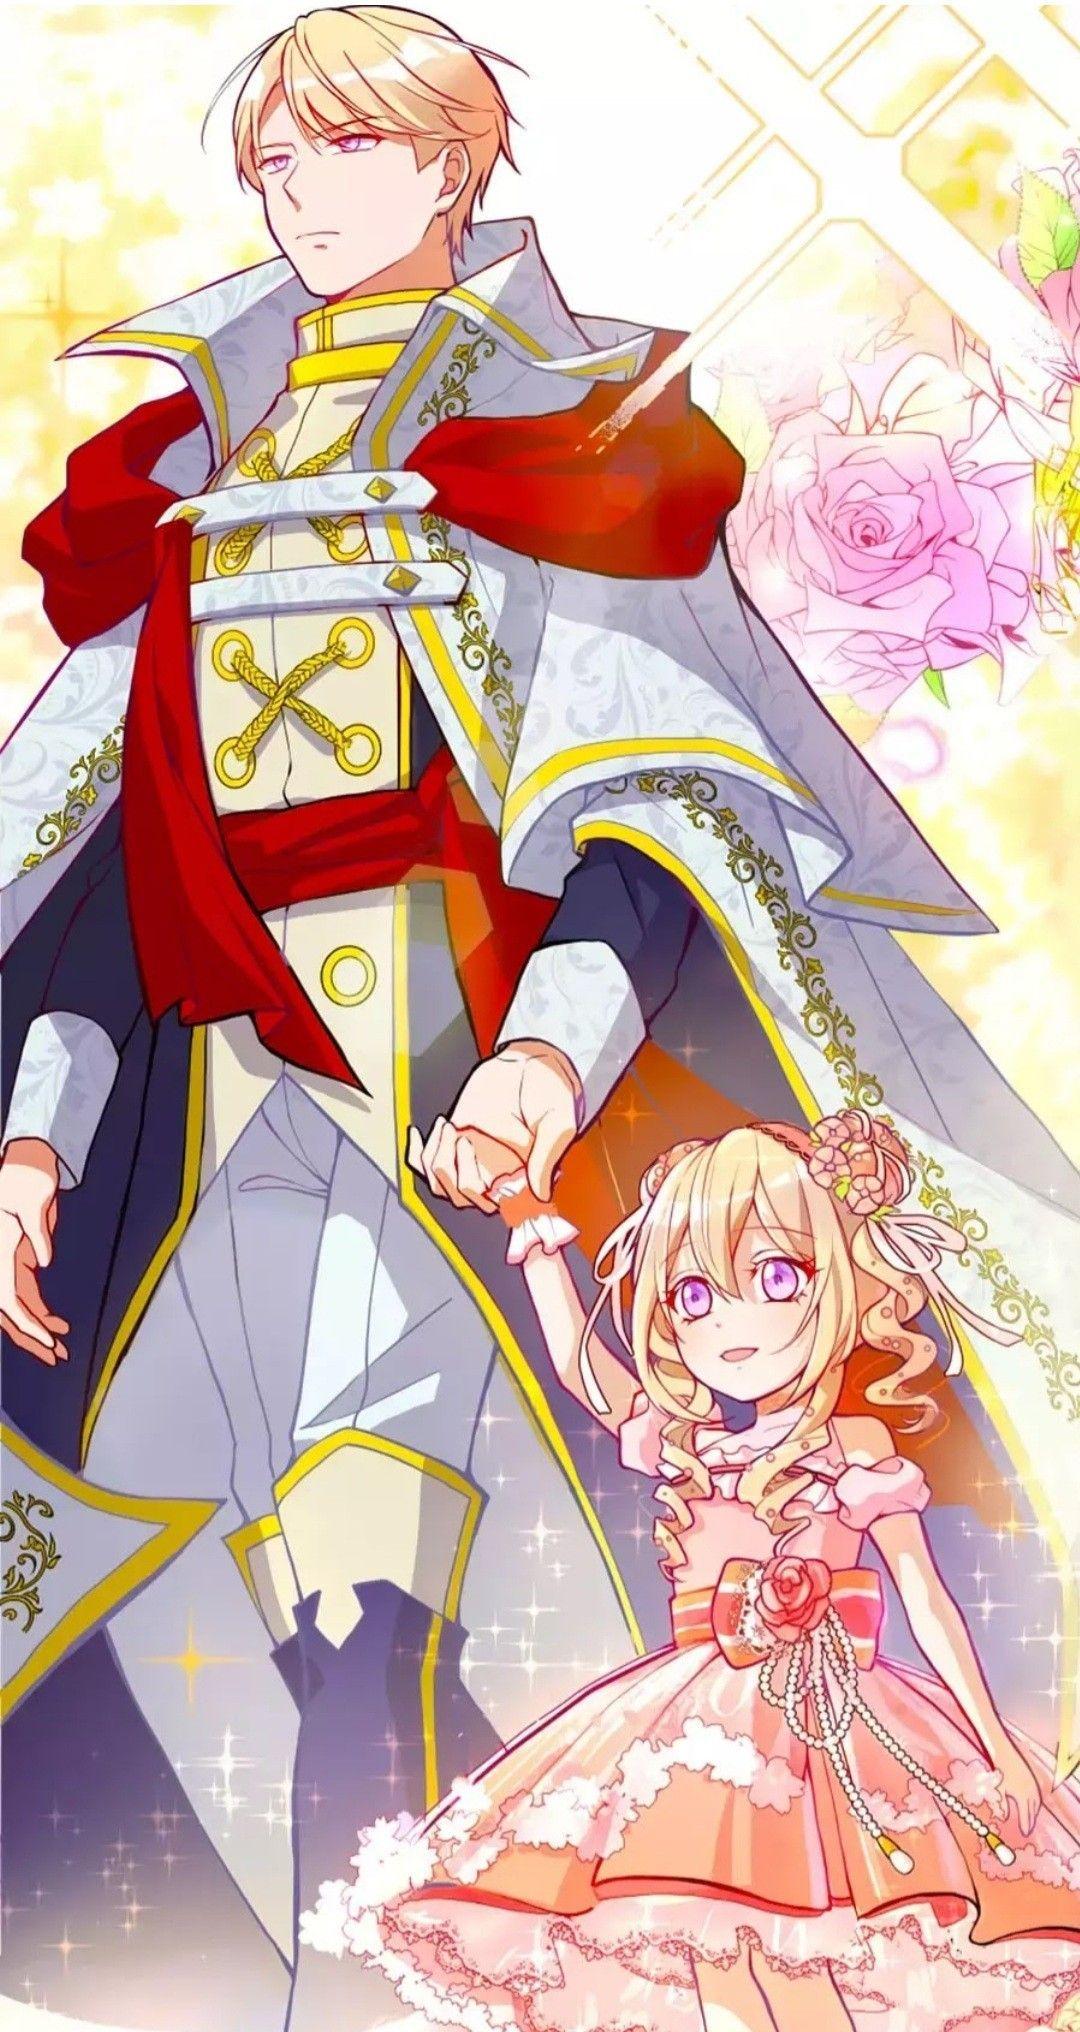 Pin by kurahashi reii on manga anime in 2020 anime